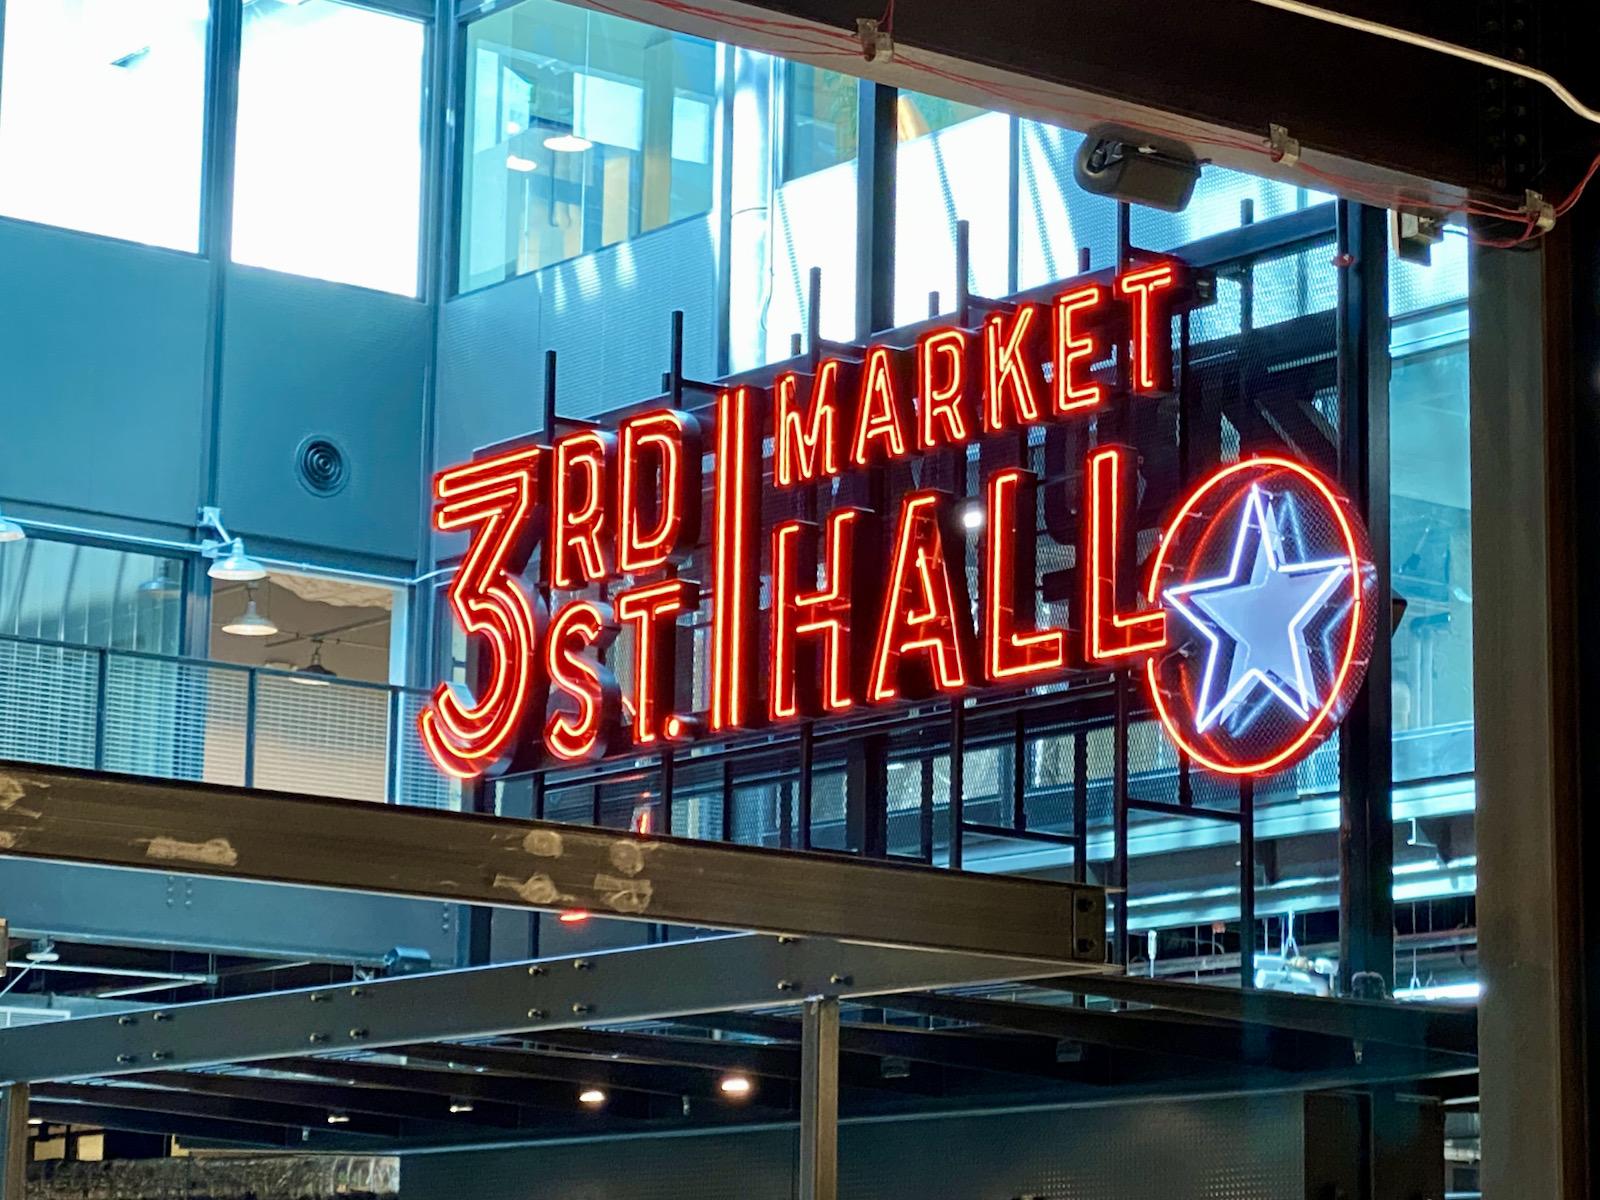 Neon 3rd Street Market Hall sign